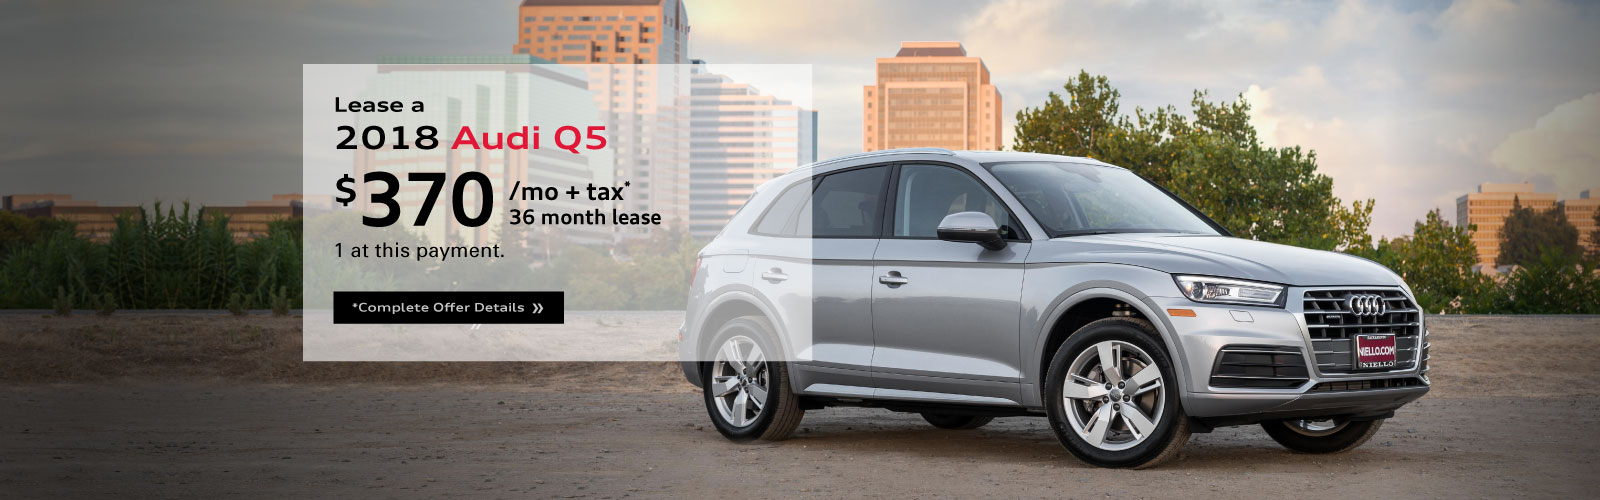 Niello Audi New Audi Dealership In Sacramento CA - Audi online payment